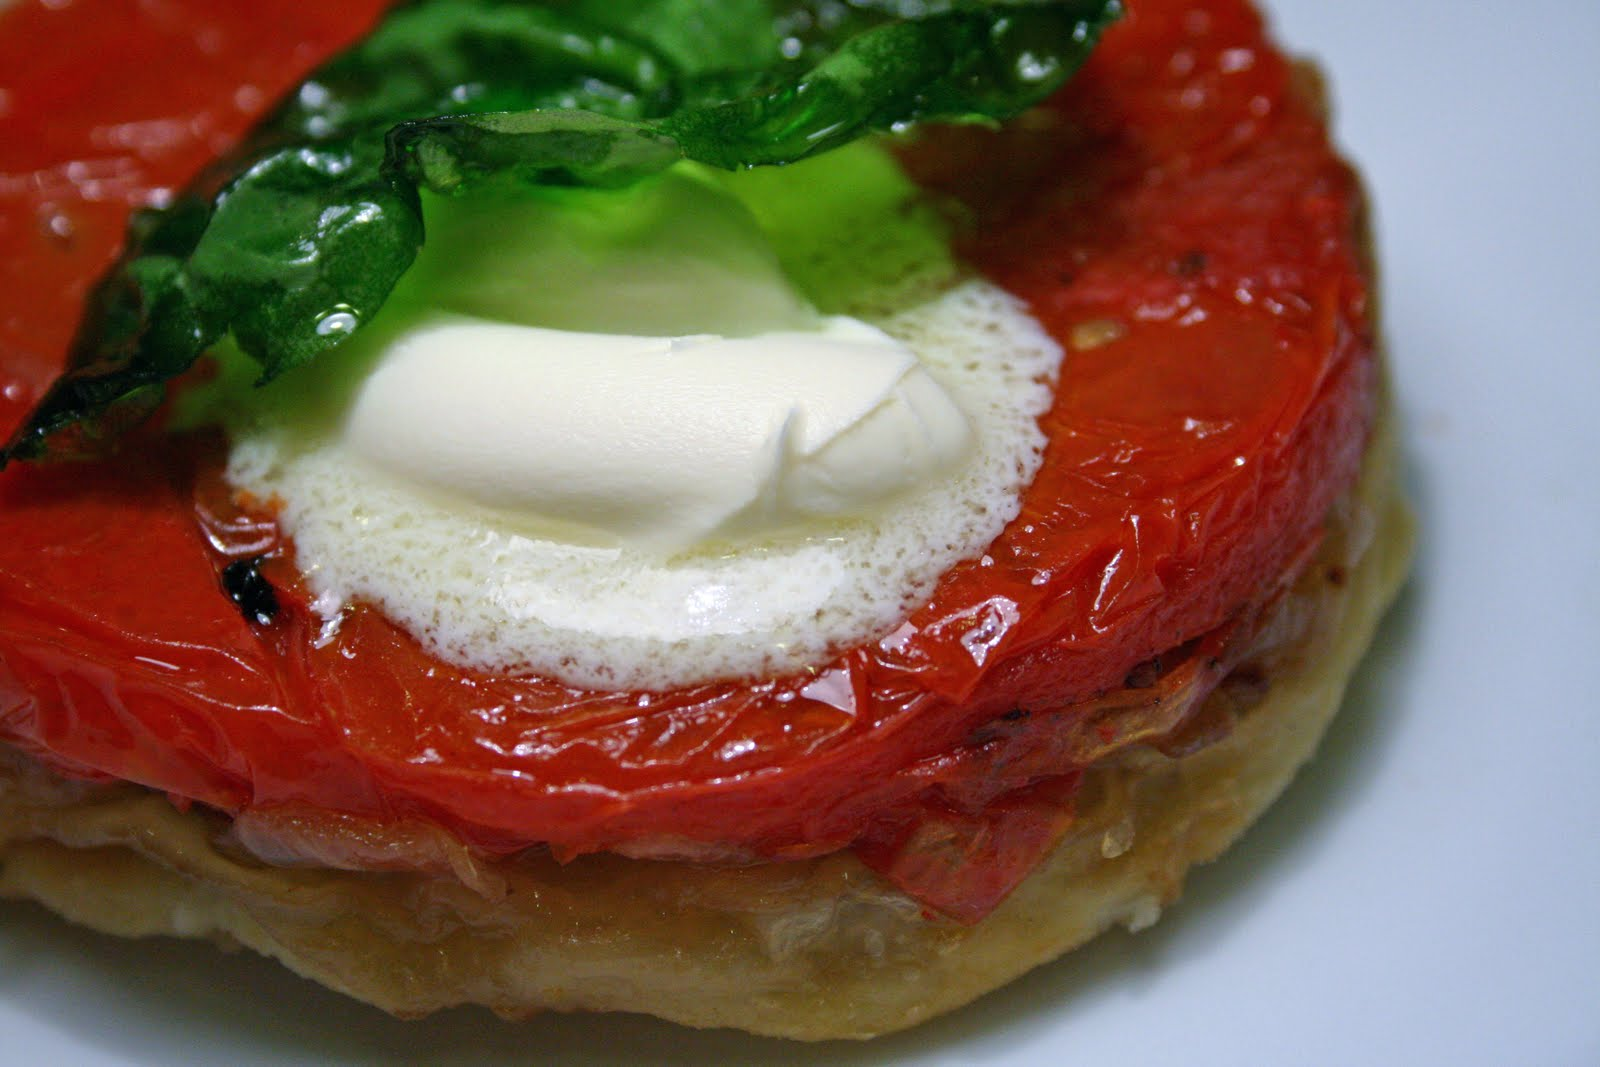 tomato tarte tatin (adapted from Barbara Lynch's Stir) - Home - the ...